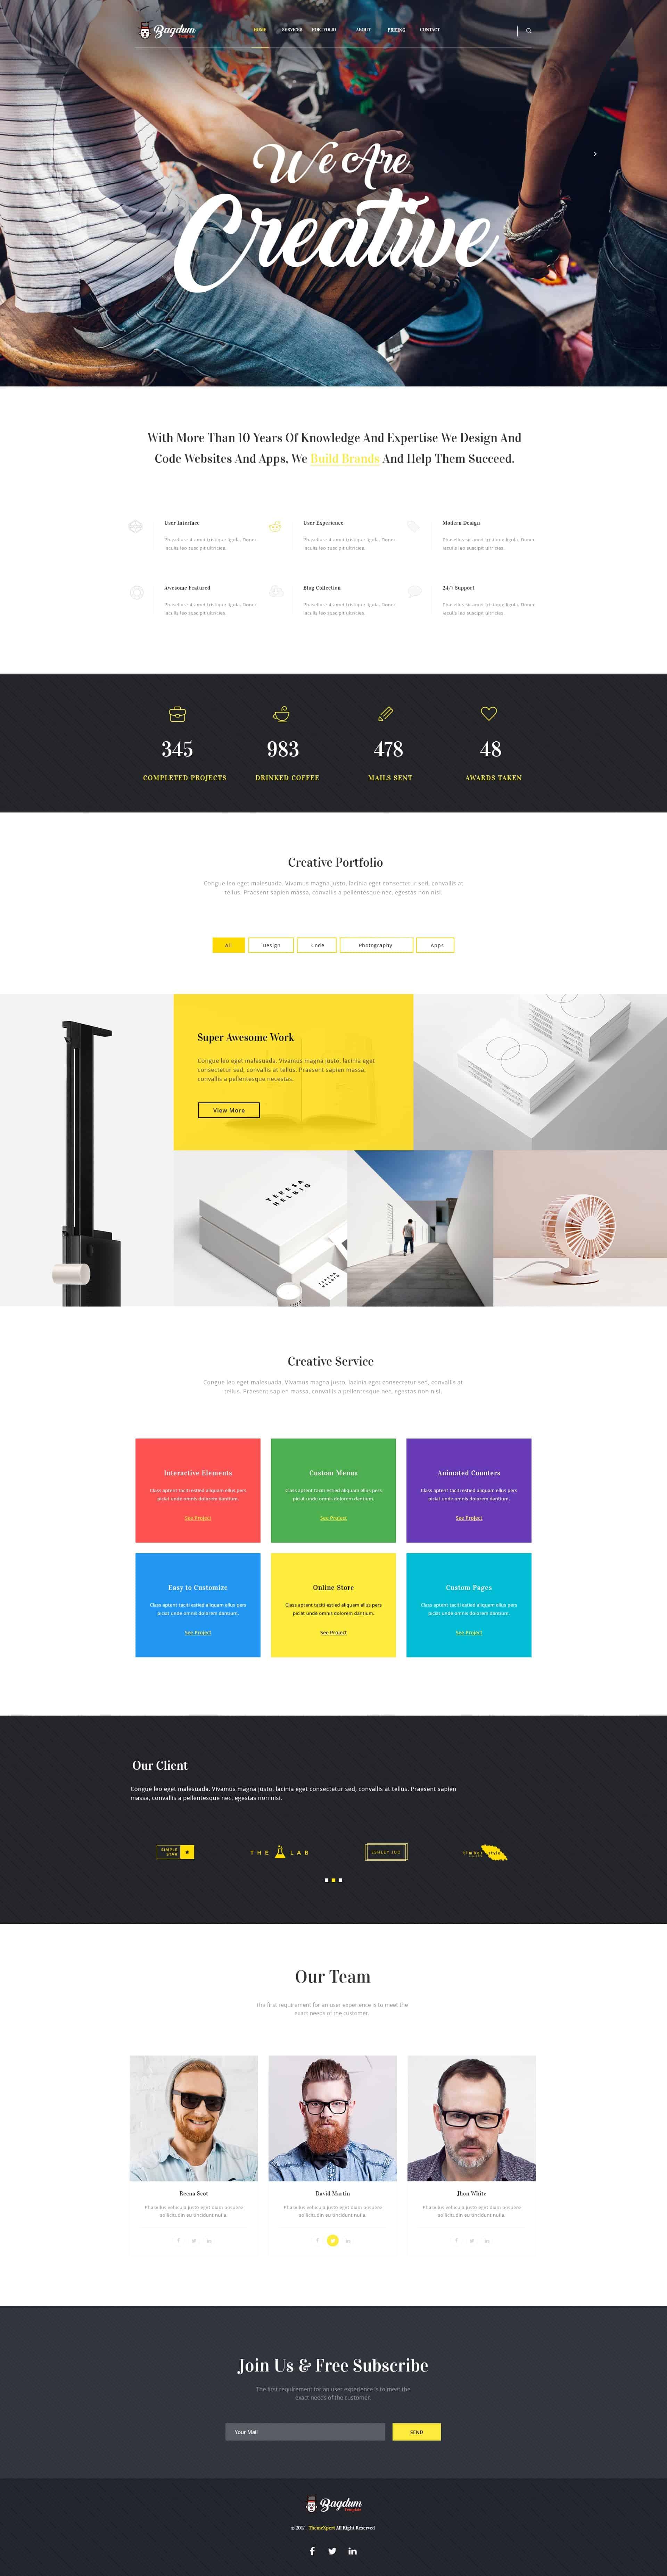 Bagdum UI Kit - Website Template for Creative Agency 1